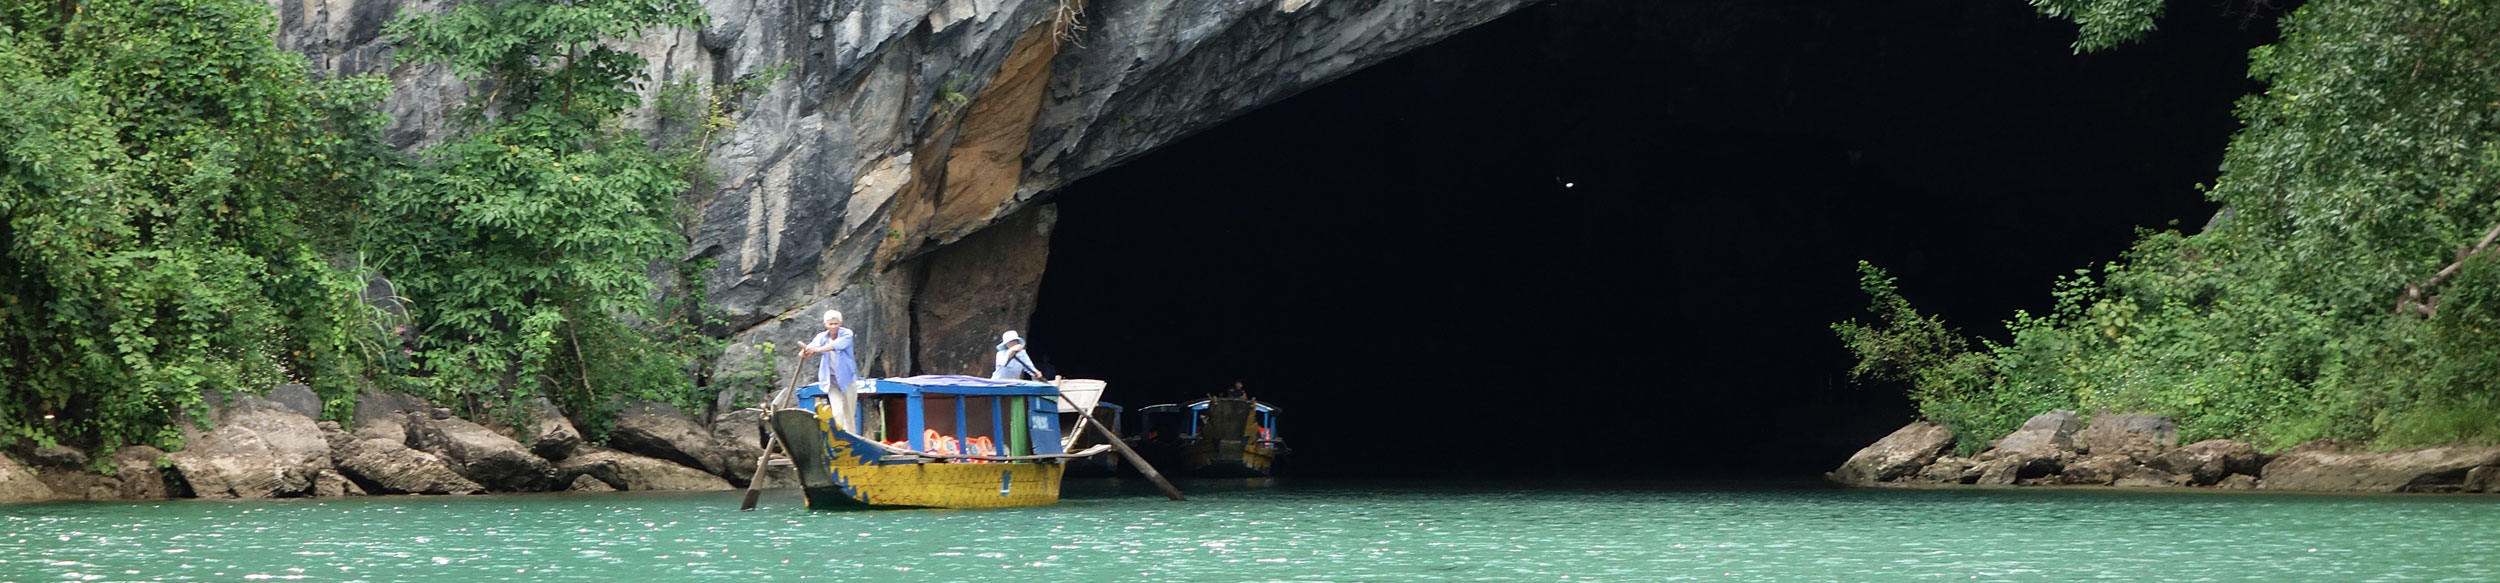 Bateau touristiques sortant de la grotte de Phong Nha